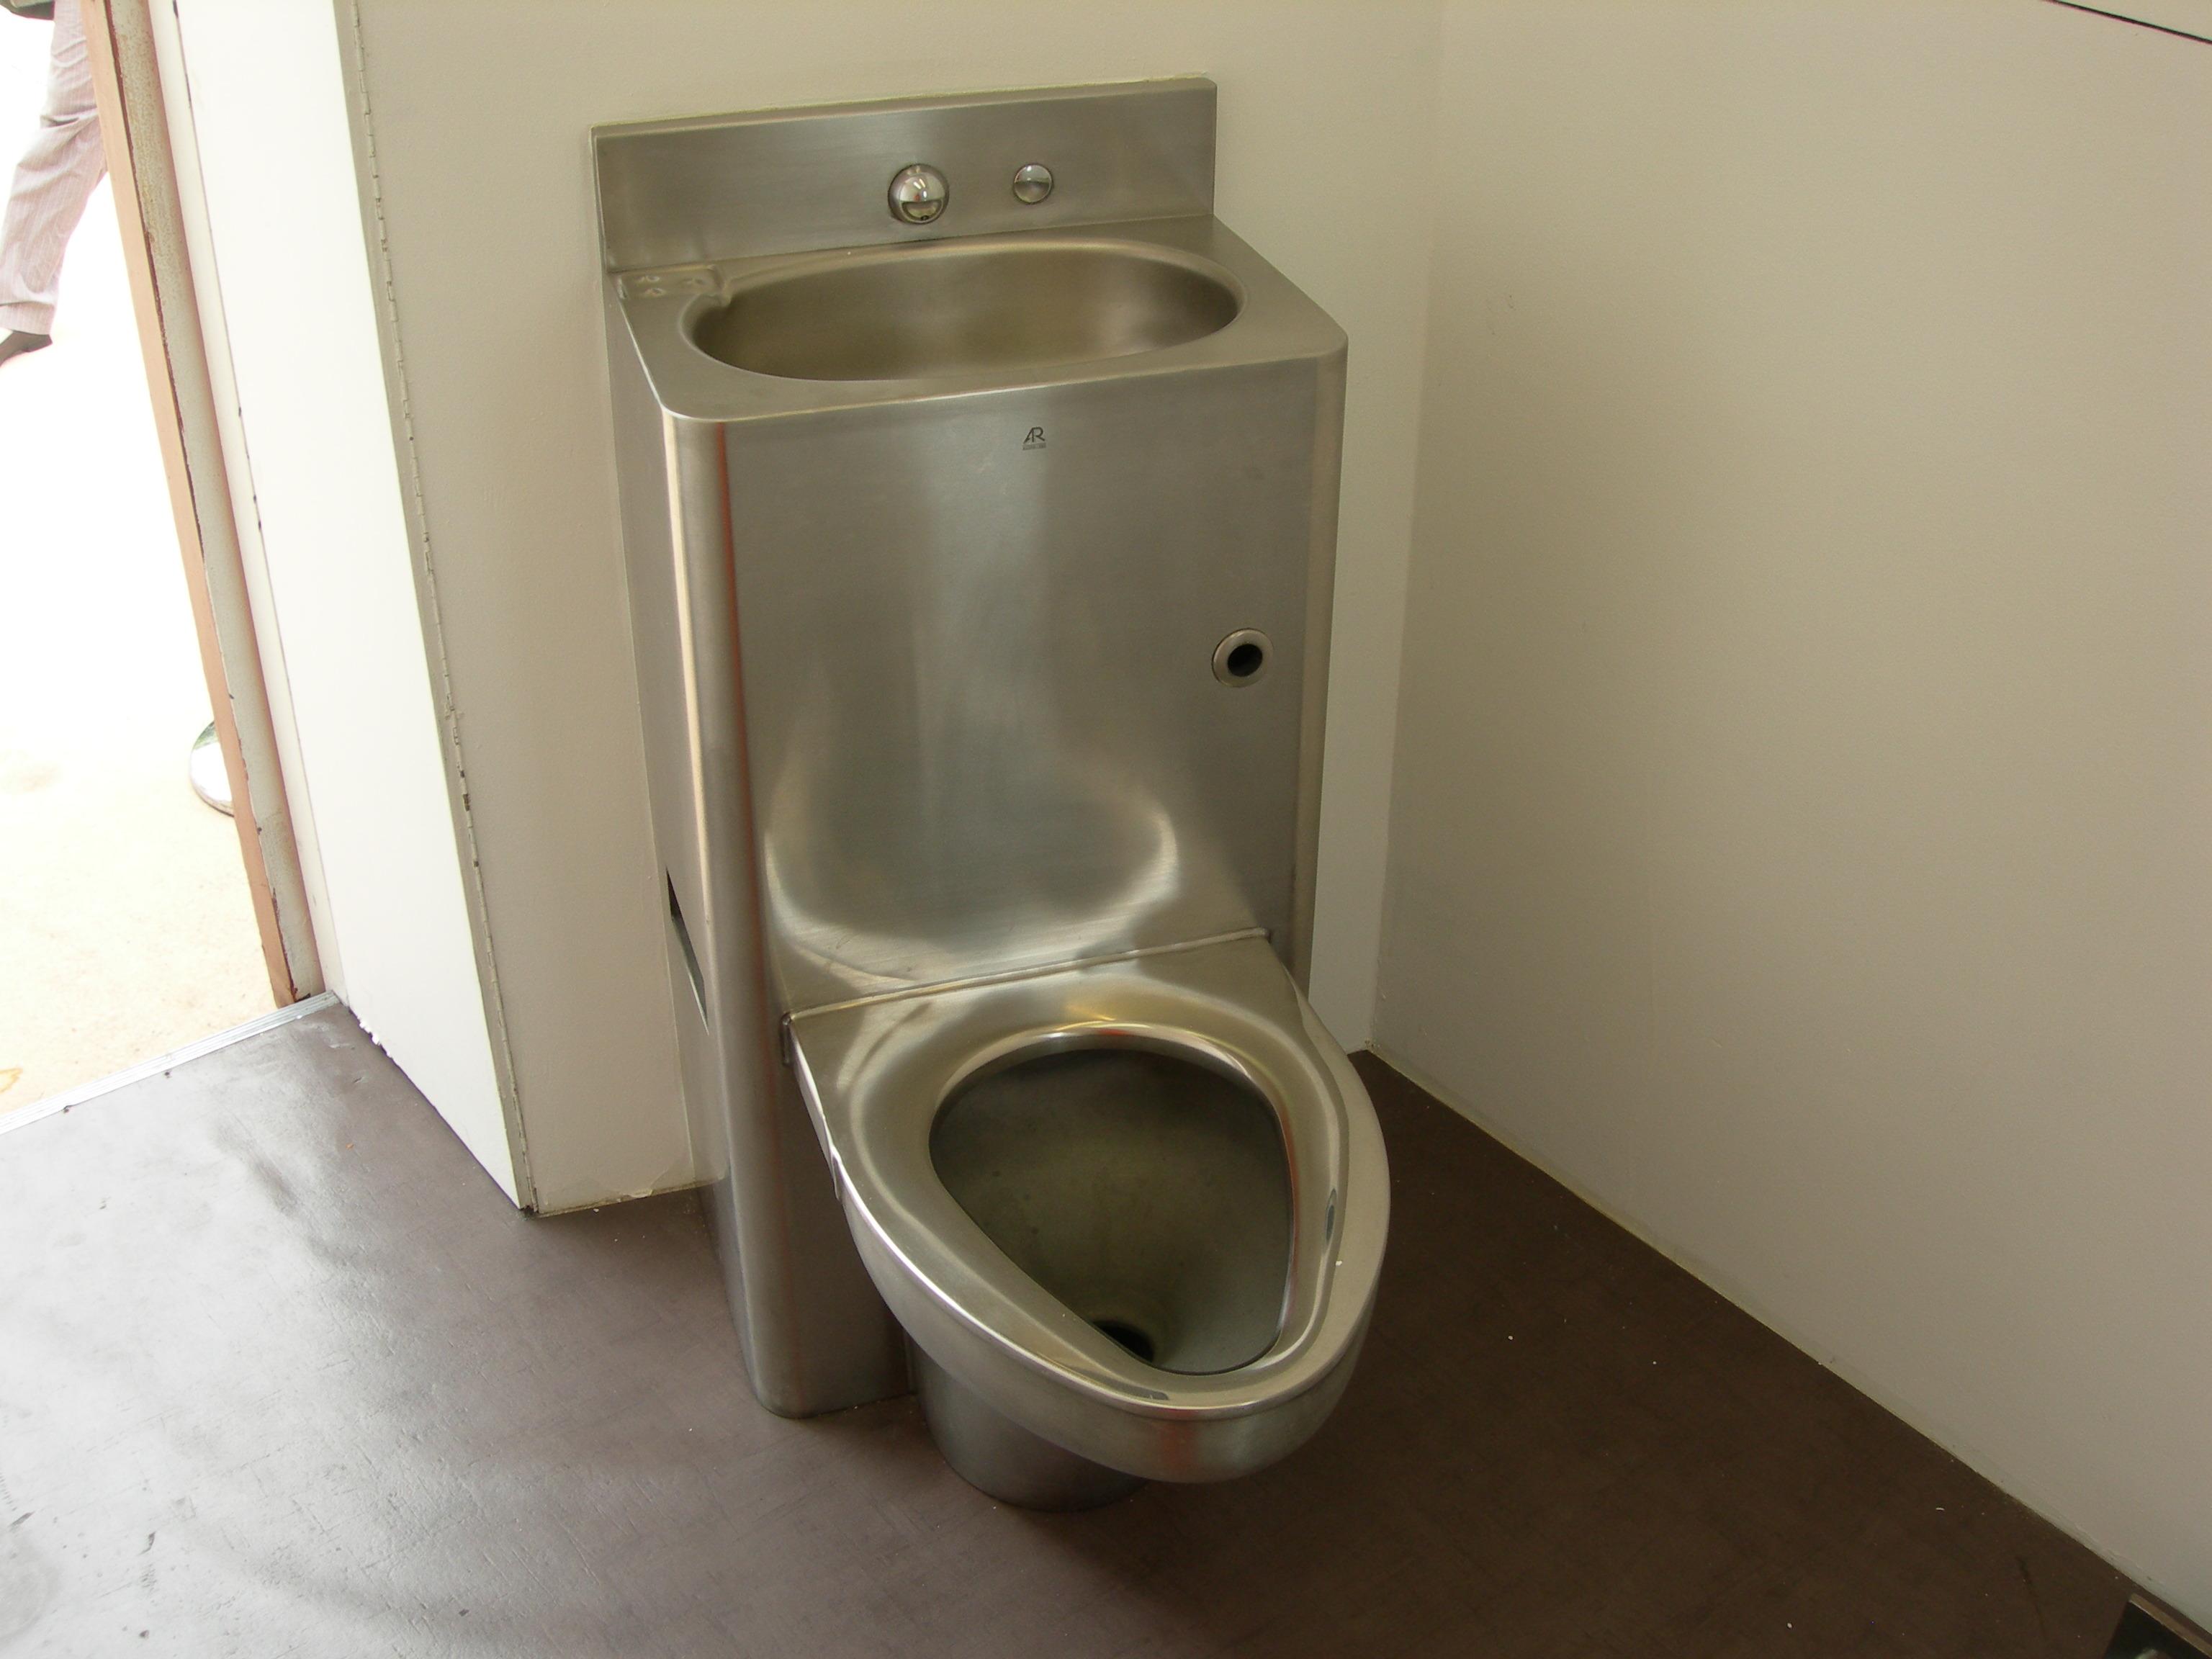 Toilet | Wikidwelling | FANDOM powered by Wikia